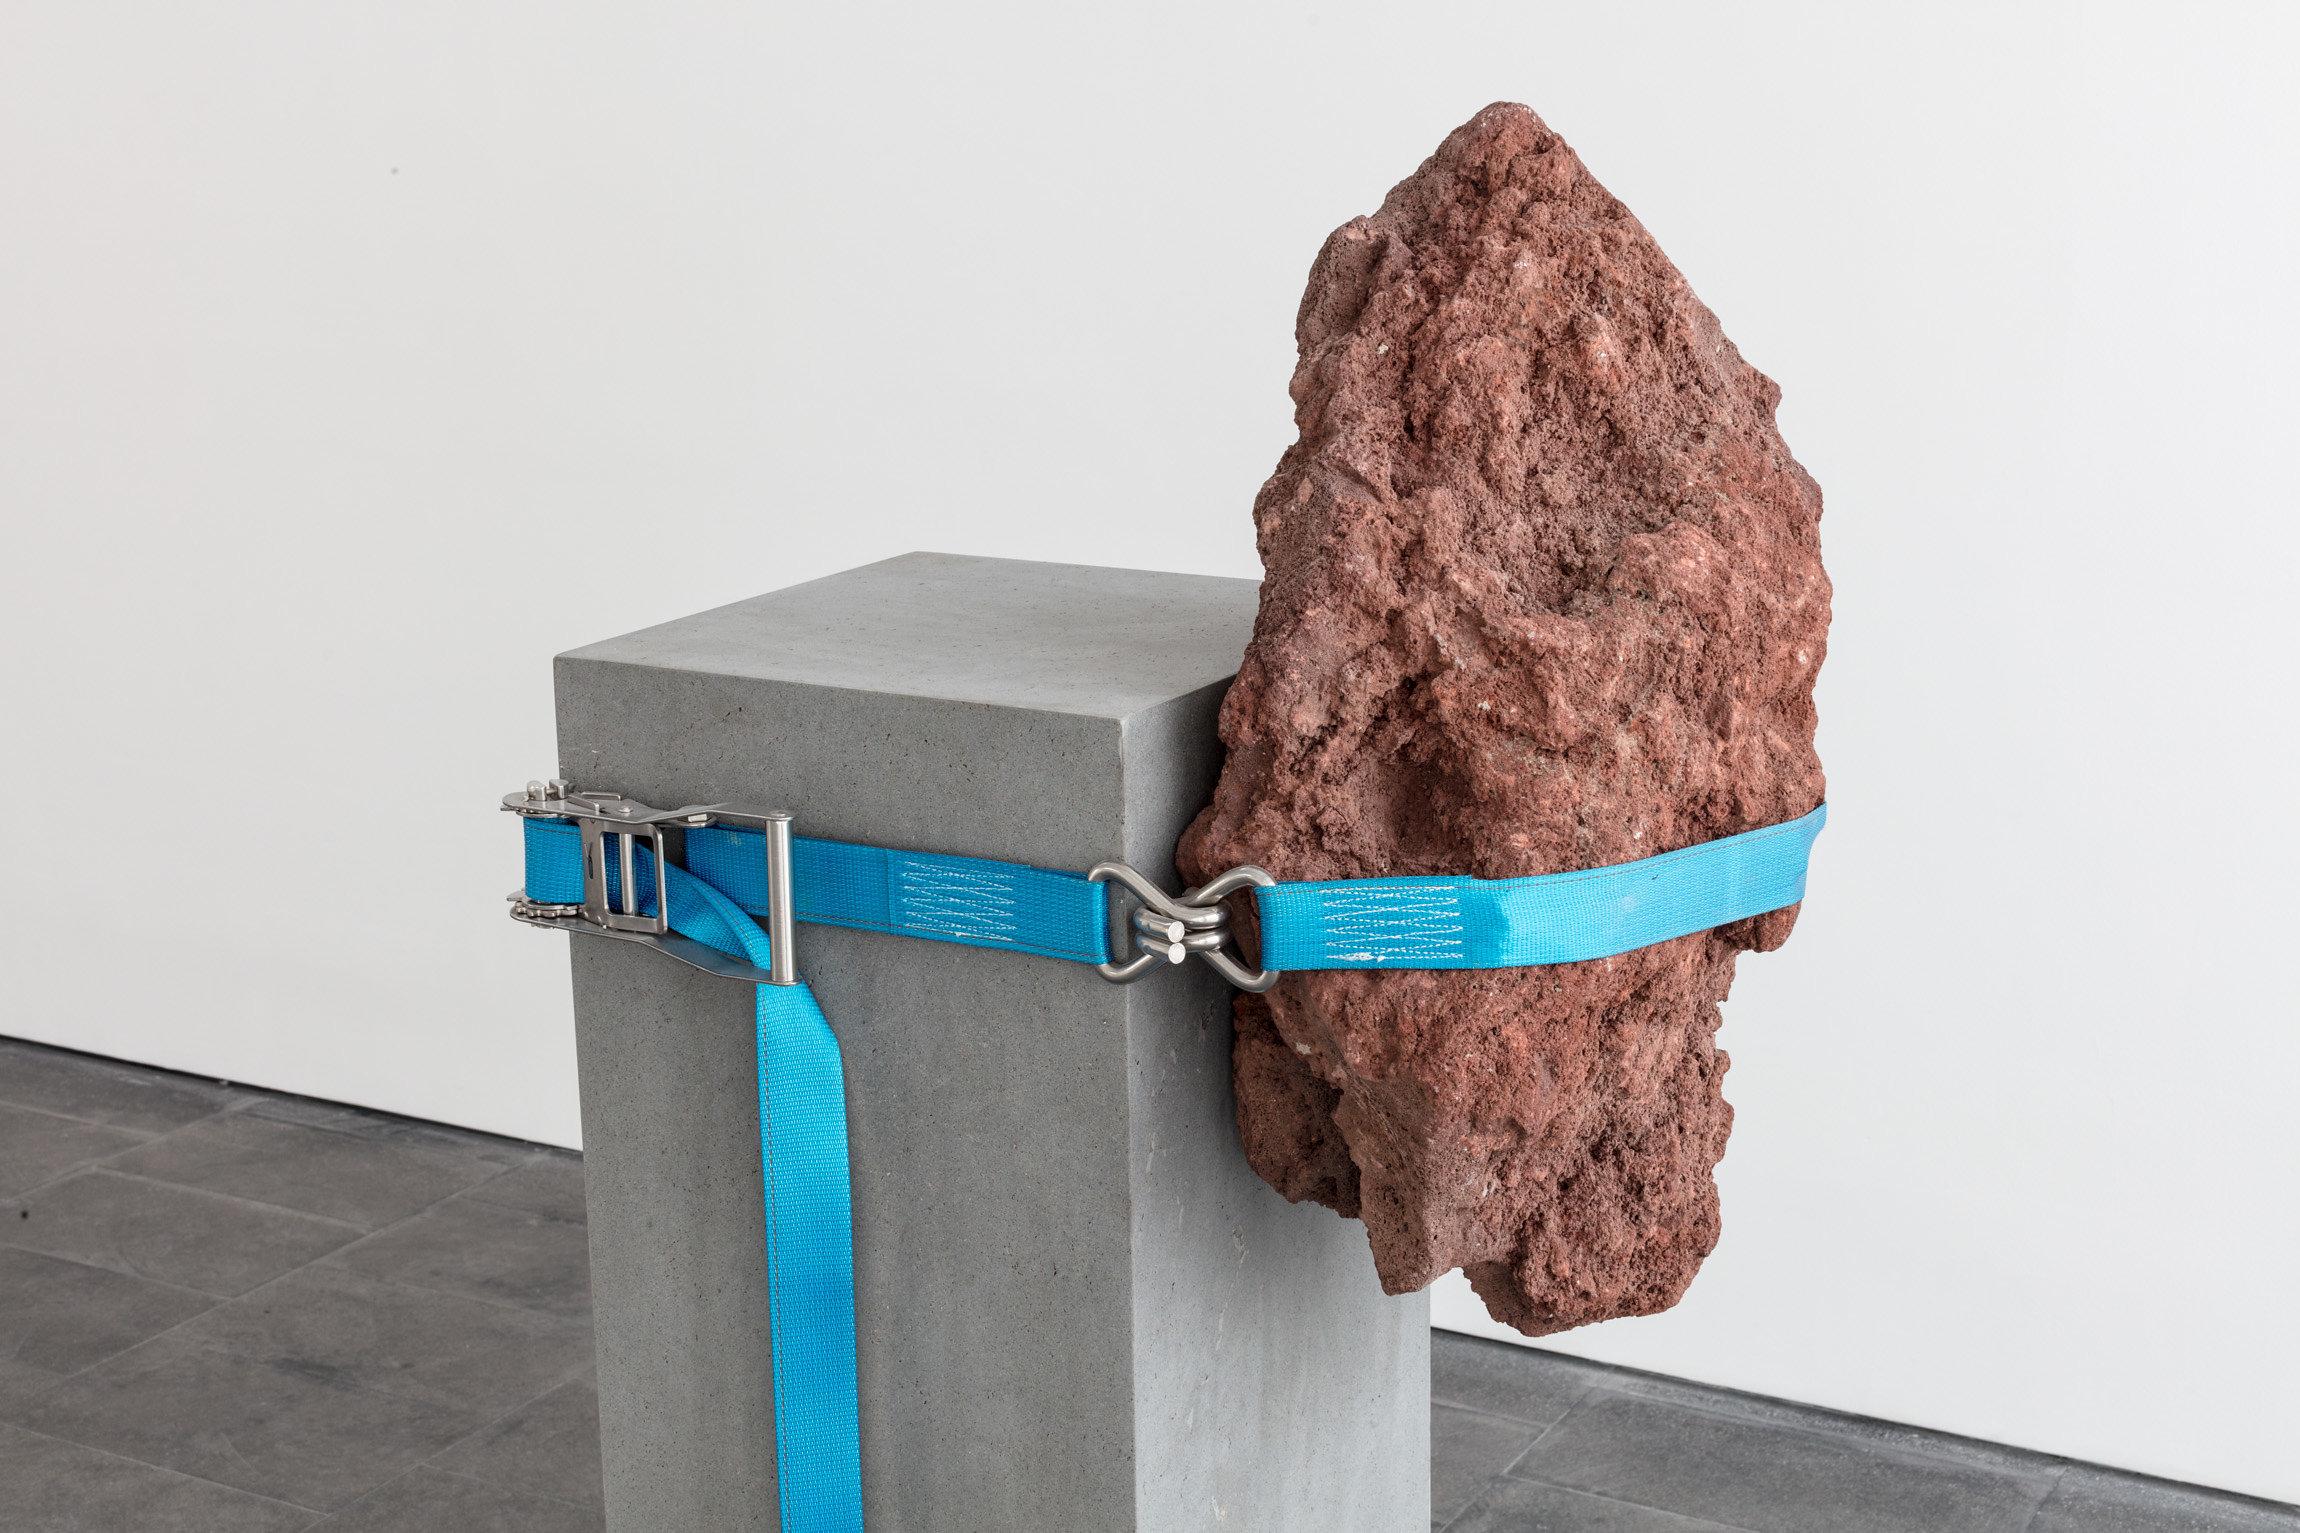 13. Mecánica de lo inestable, Jose Dávila, 2018. Galería OMR, Mexico City. Image: Enrique Macías. Courtesy of Galería OMR.